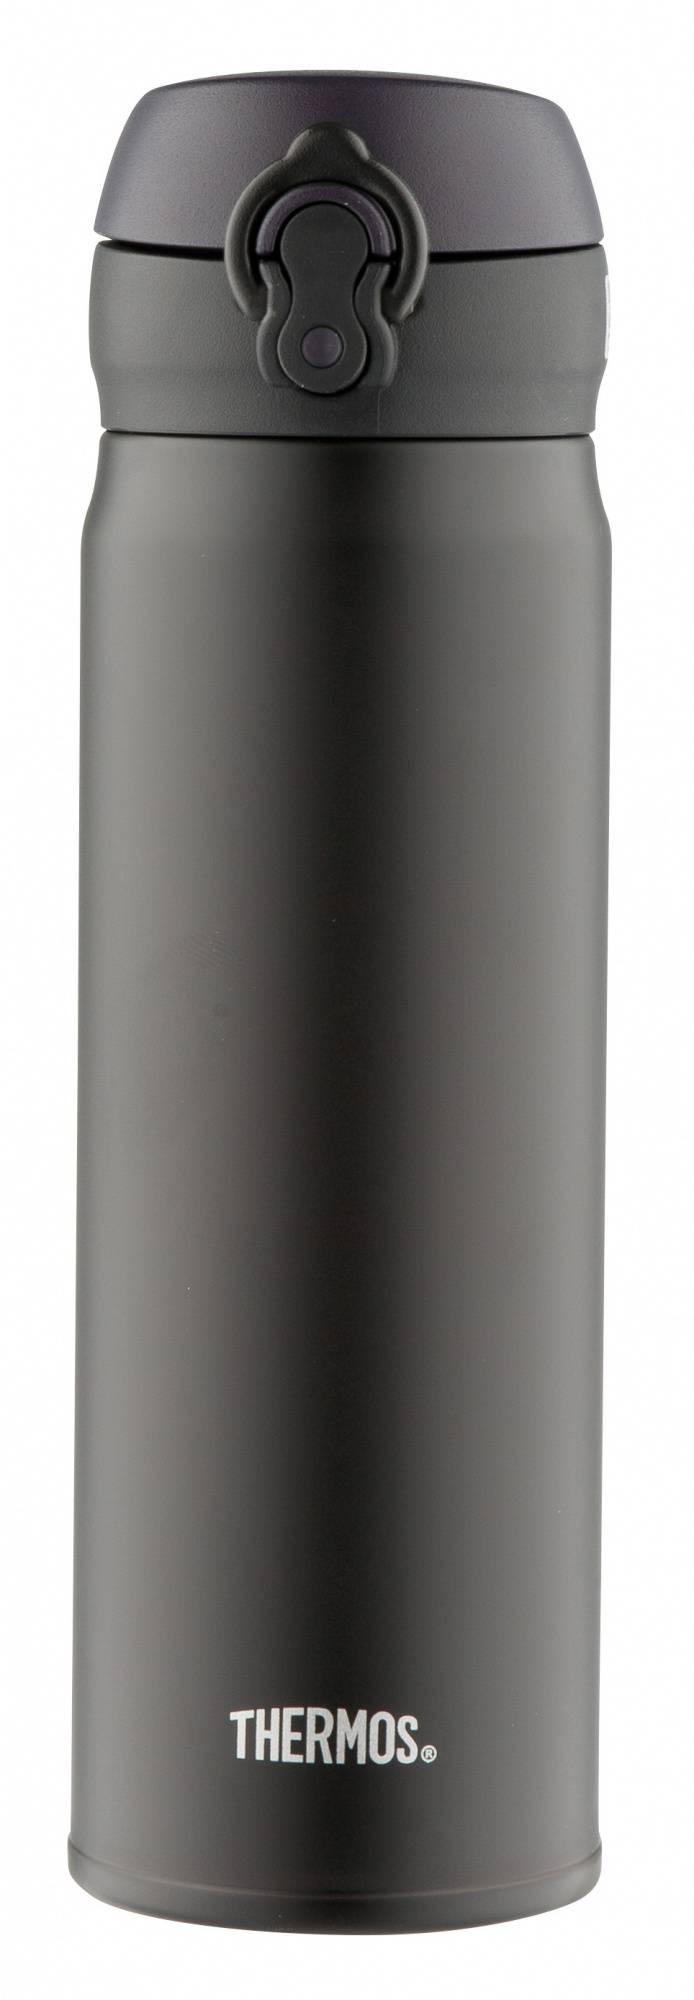 Термос Thermos JNL-502-ALB SS черный (935120) - фото 1